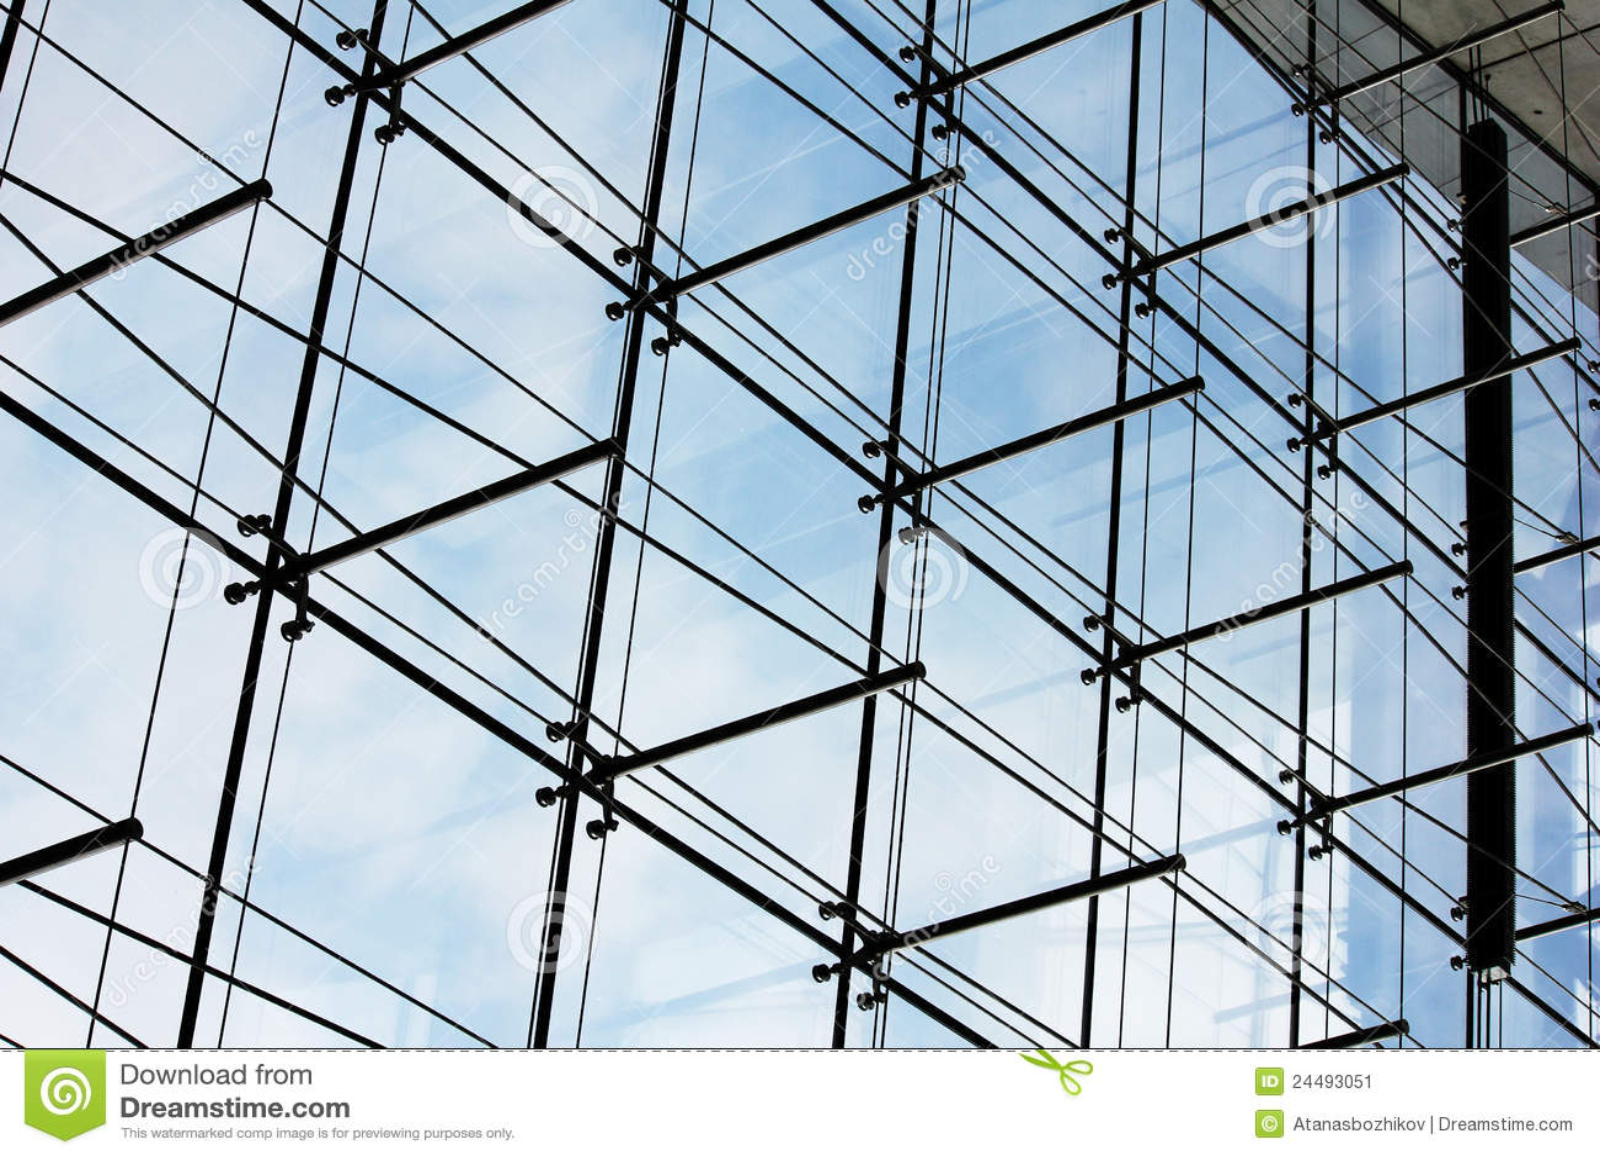 Glass Facade Detail : Glass facade architectural detail stock image